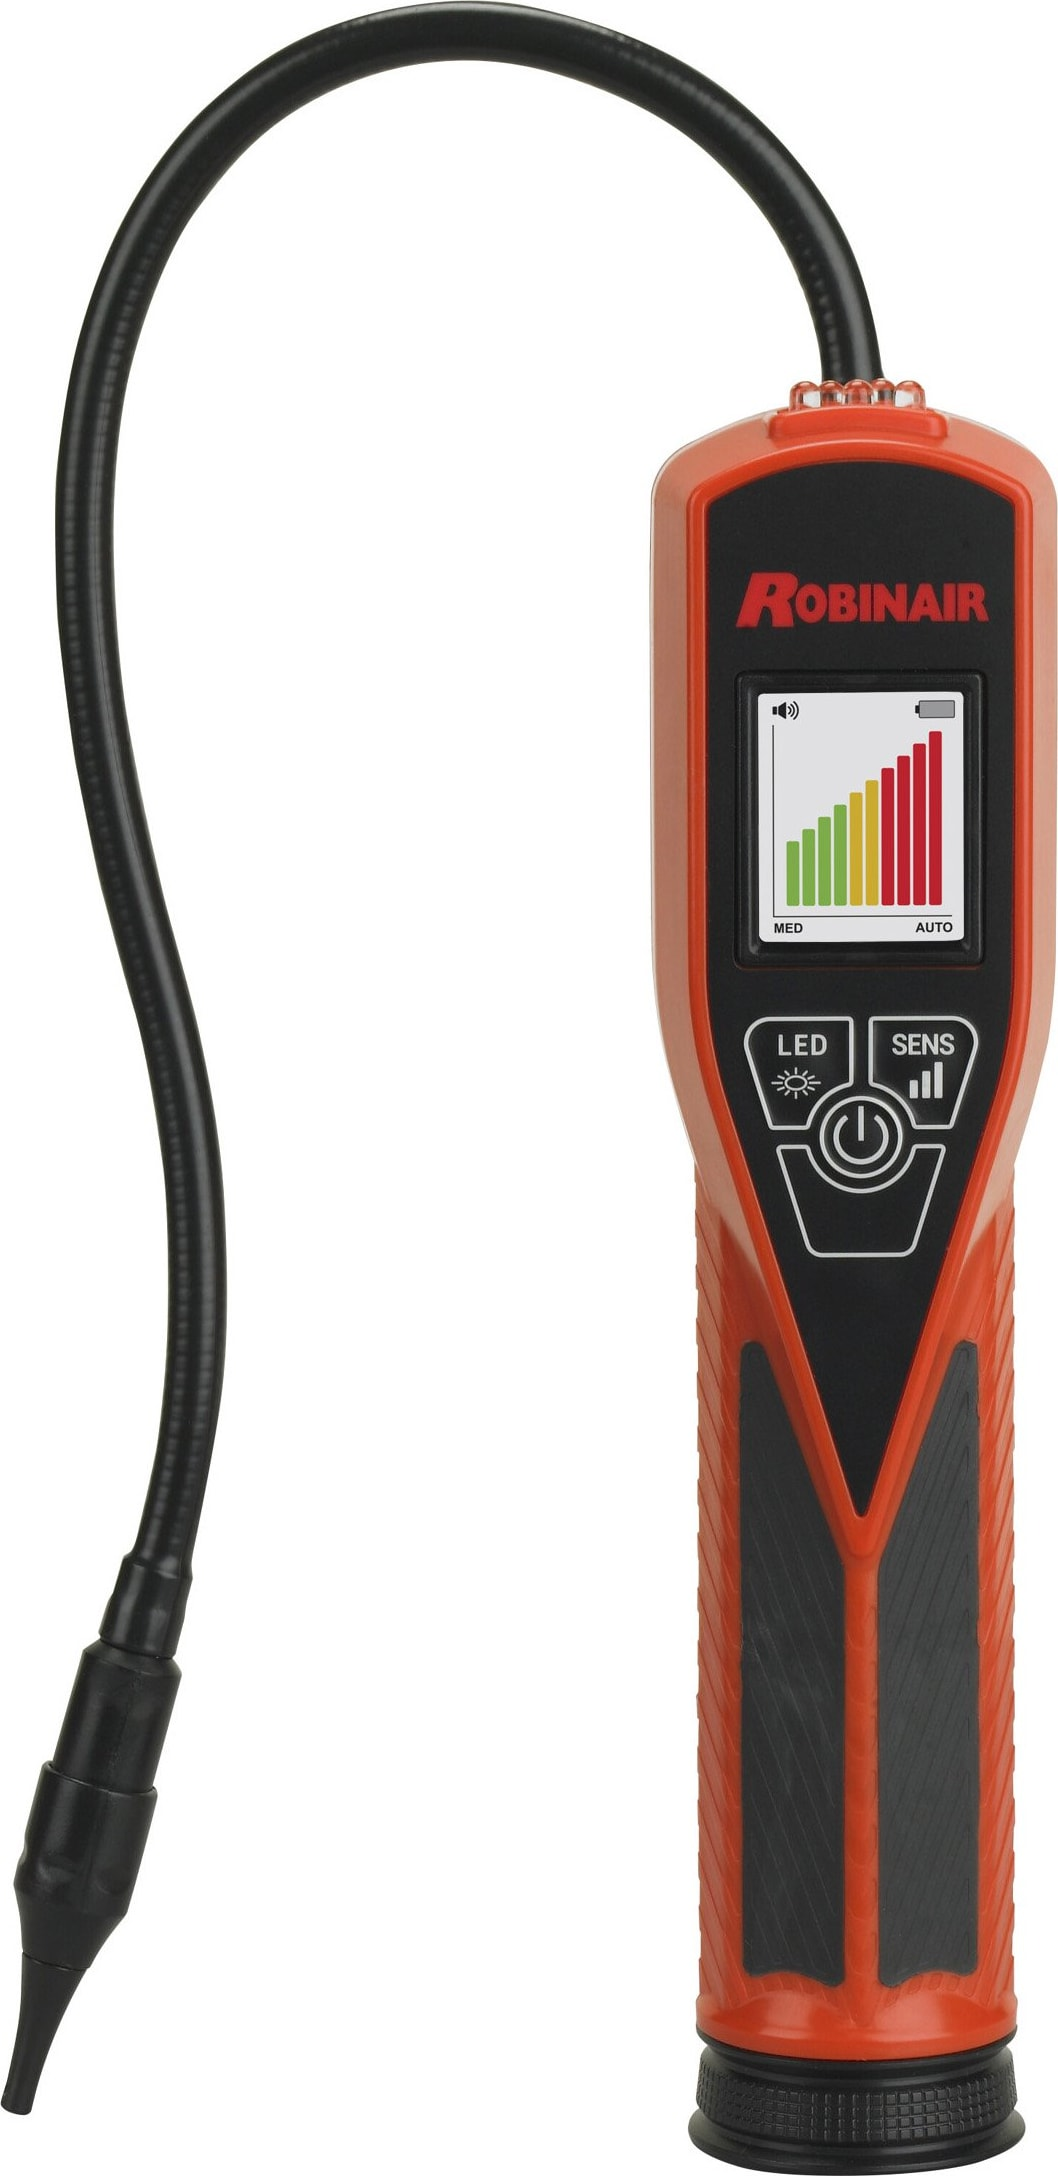 Robinair Ld5 Select Refrigerant Leak Detector Tequipment